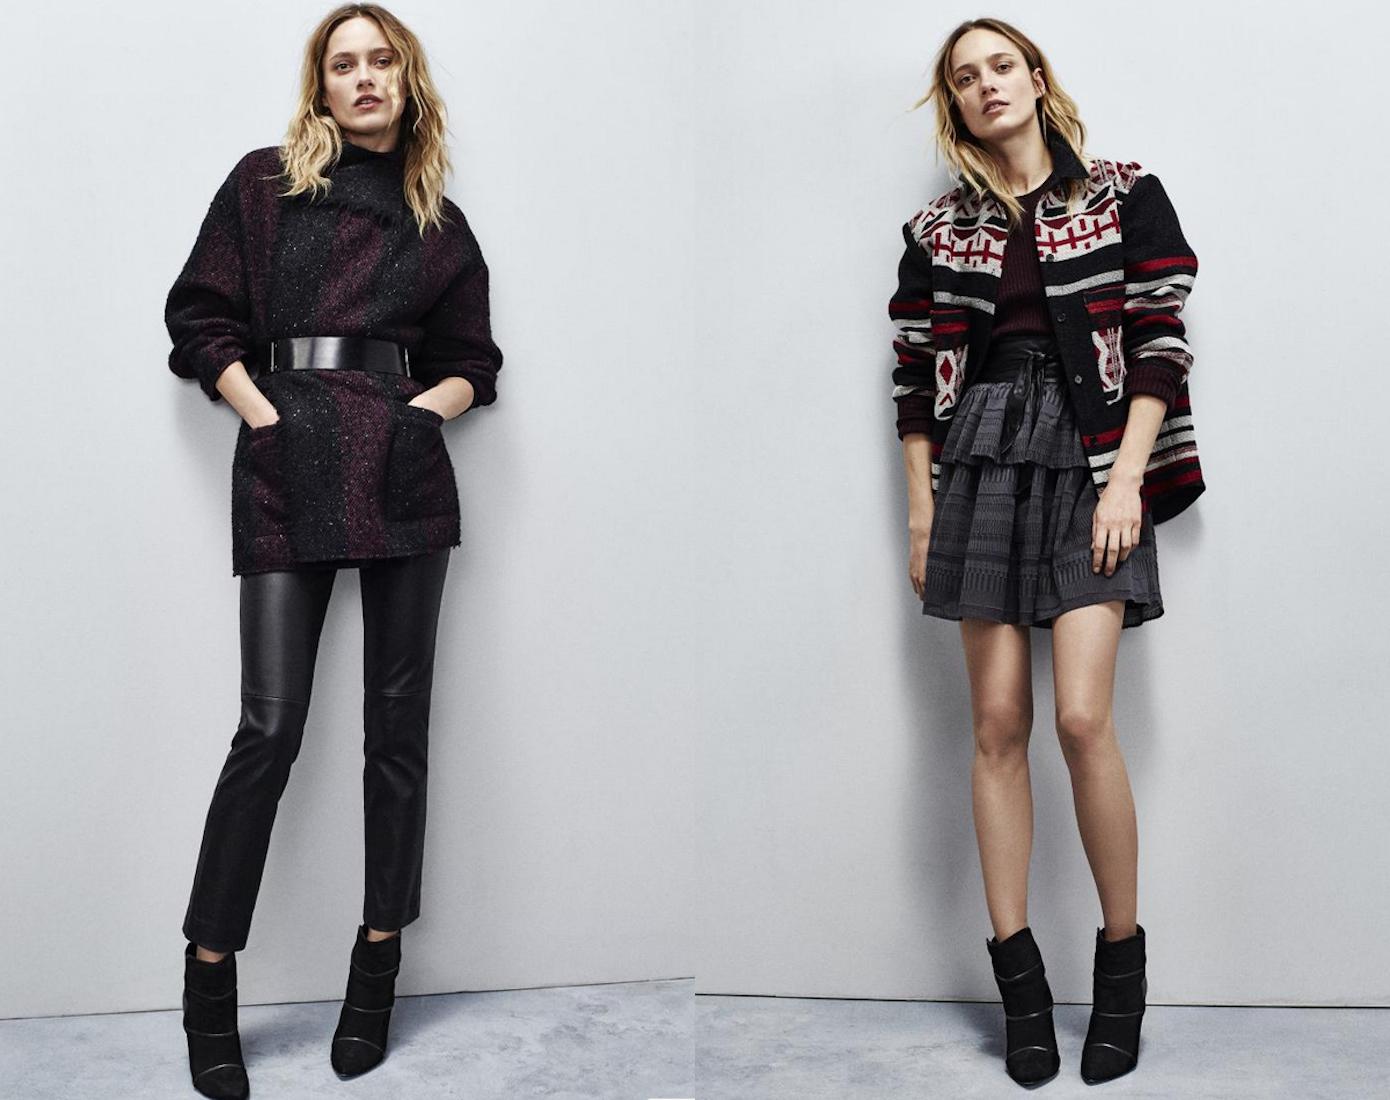 iro collection automne hiver 2015 2016 taaora blog mode tendances looks. Black Bedroom Furniture Sets. Home Design Ideas